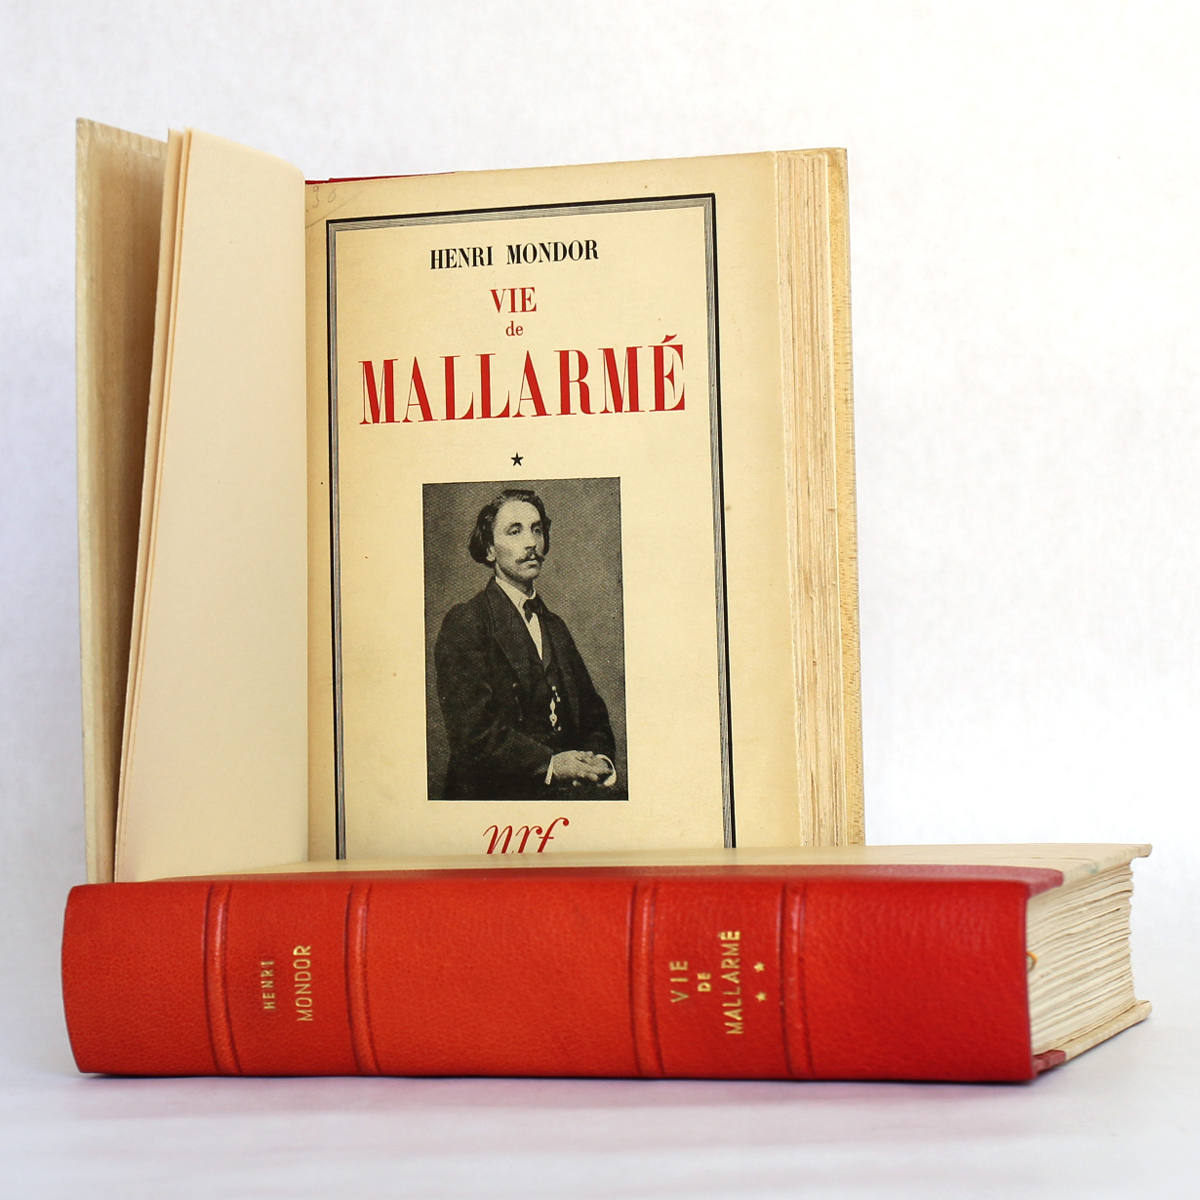 La vie de Mallarmé, Henri Mondor. nrf / Gallimard, 1941-1942. Page titre du volume 1.